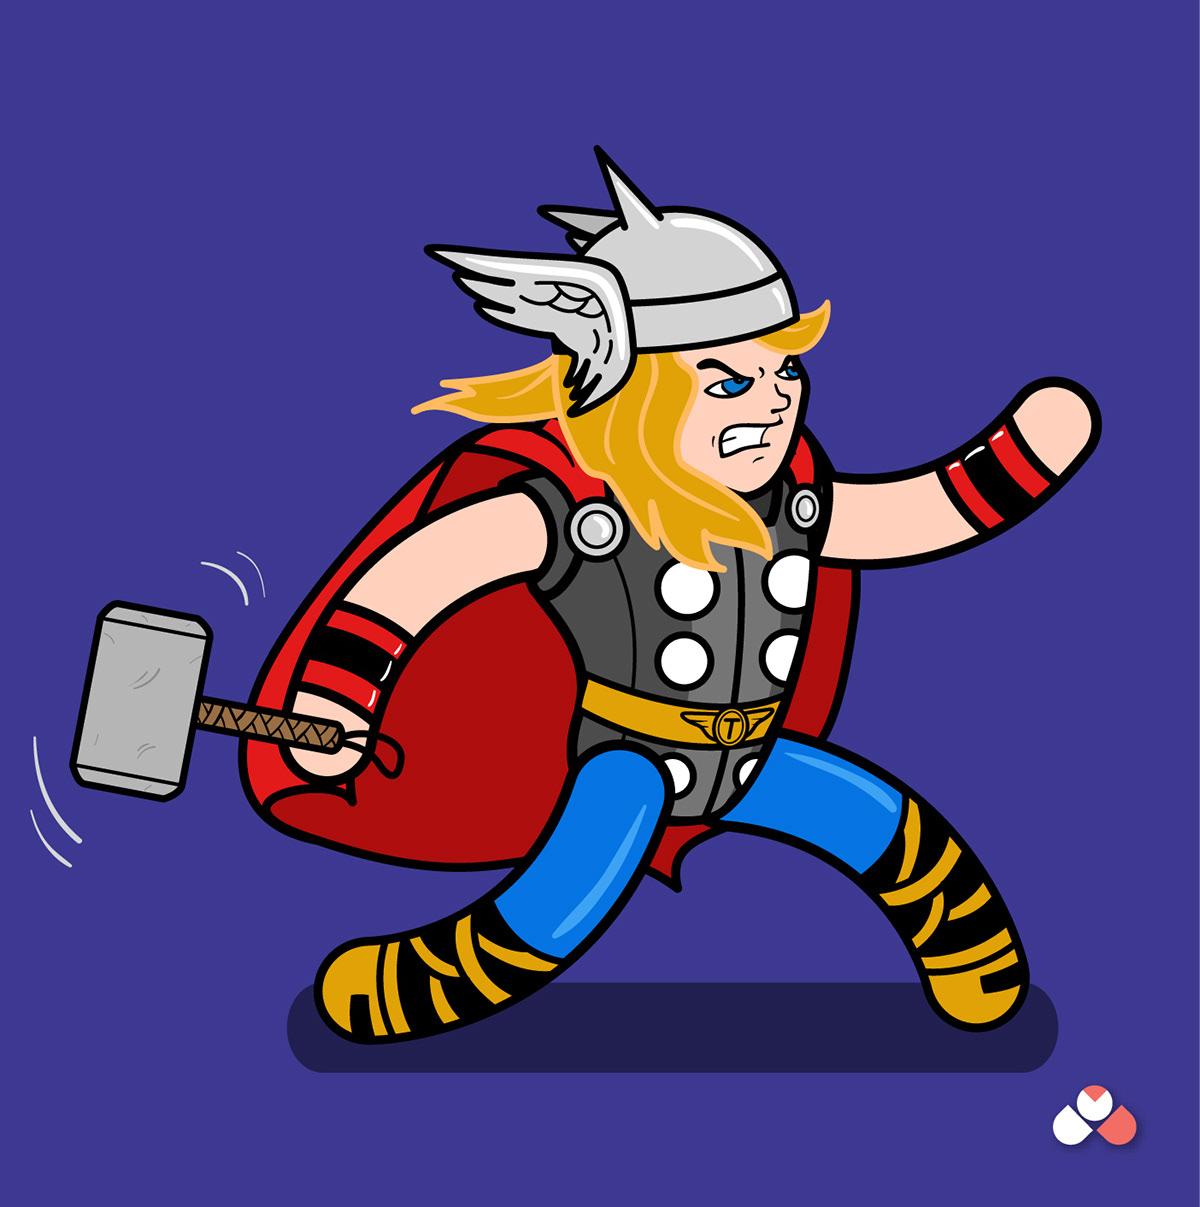 anime cartoon characters dccomics disney Games marvel Starwars Teenage Mutant Xmen